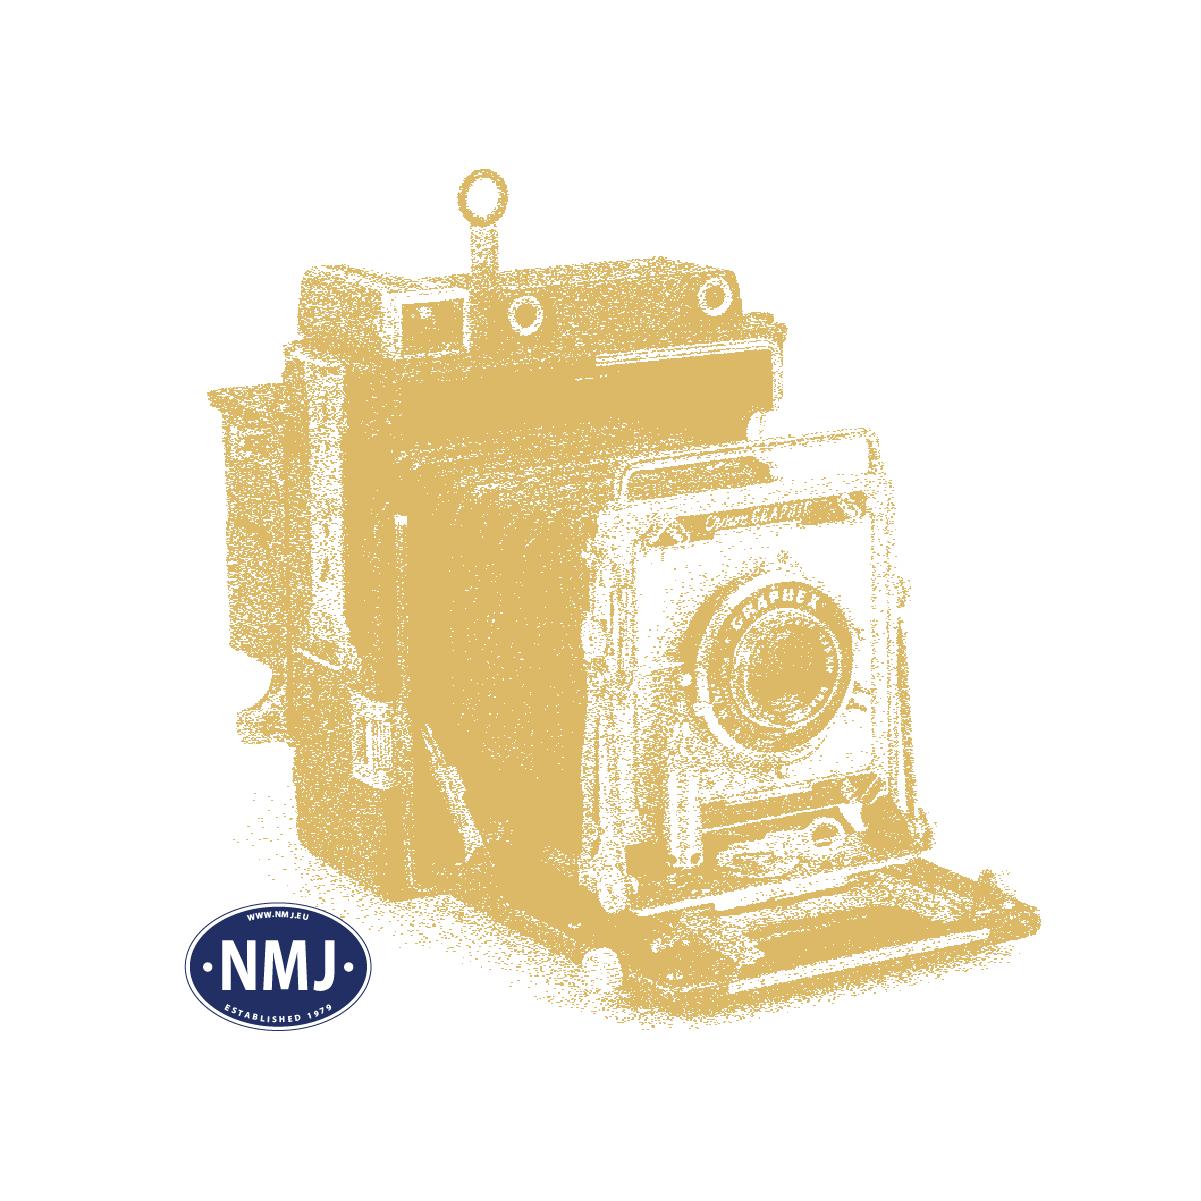 NMJT245003 - NMJ Topline NSB Di3.623, Redbrown Livery, 0-Scale, DCC w/ Sound